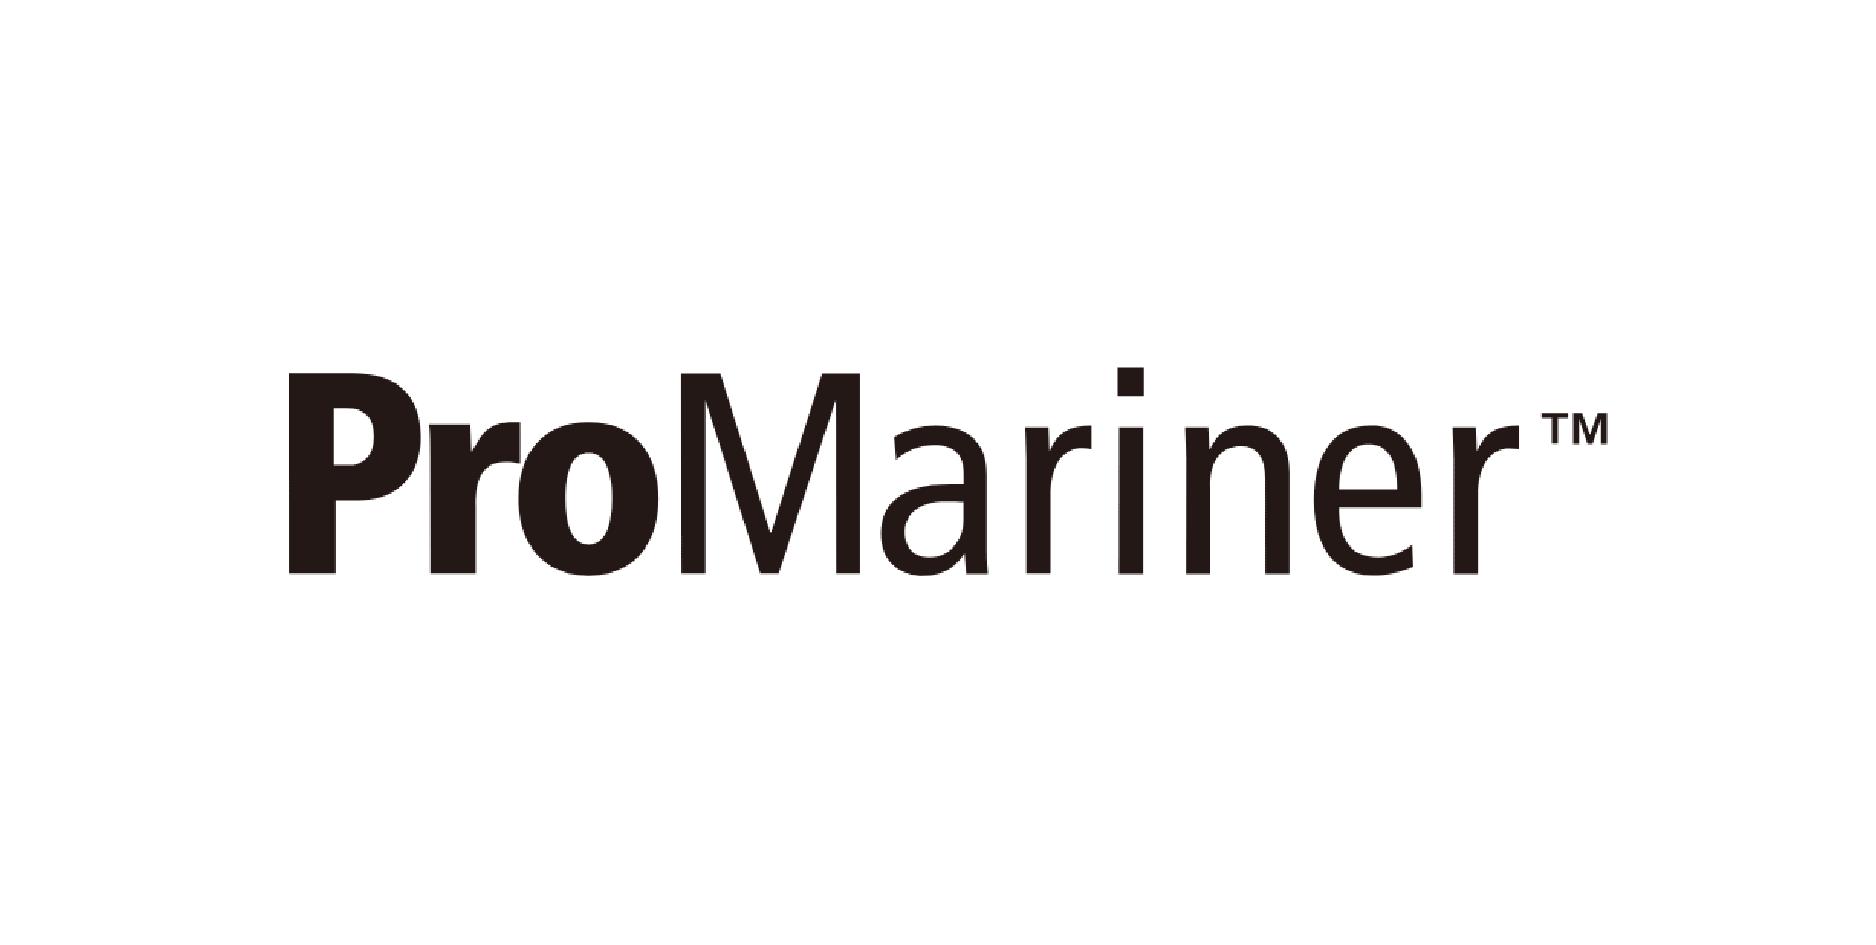 promariner-01